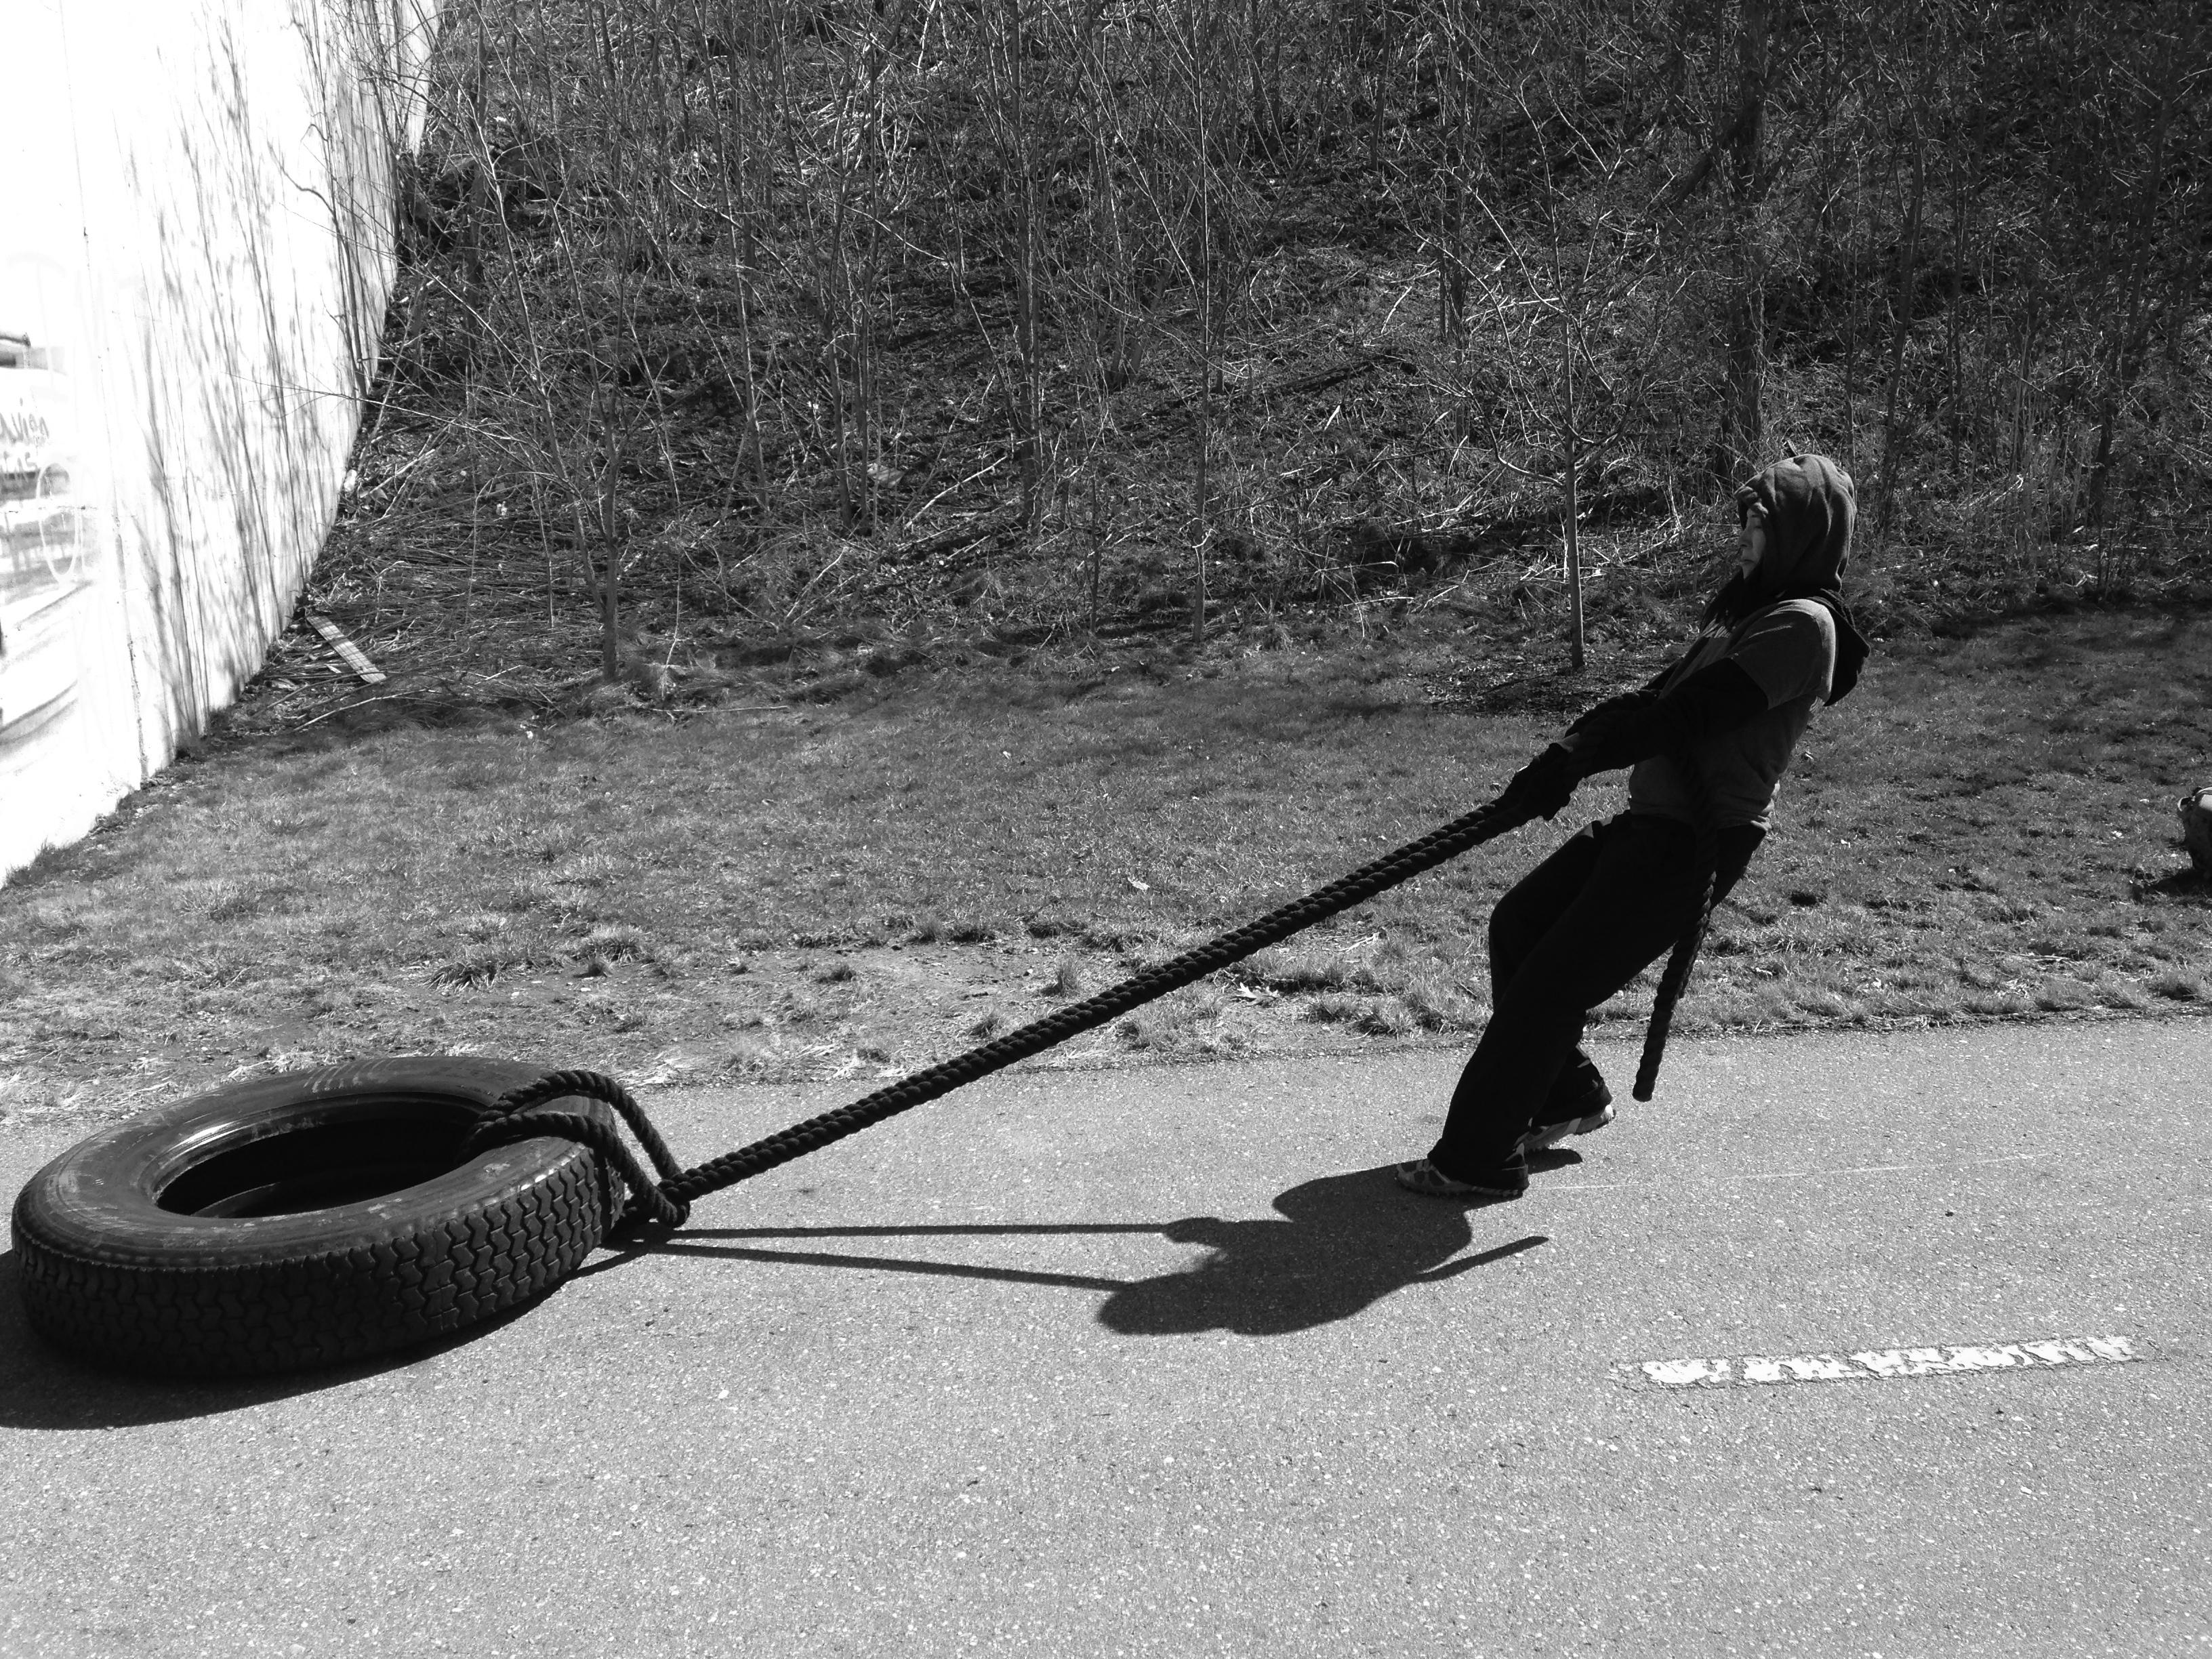 fran-pulling-tire-dc-bw